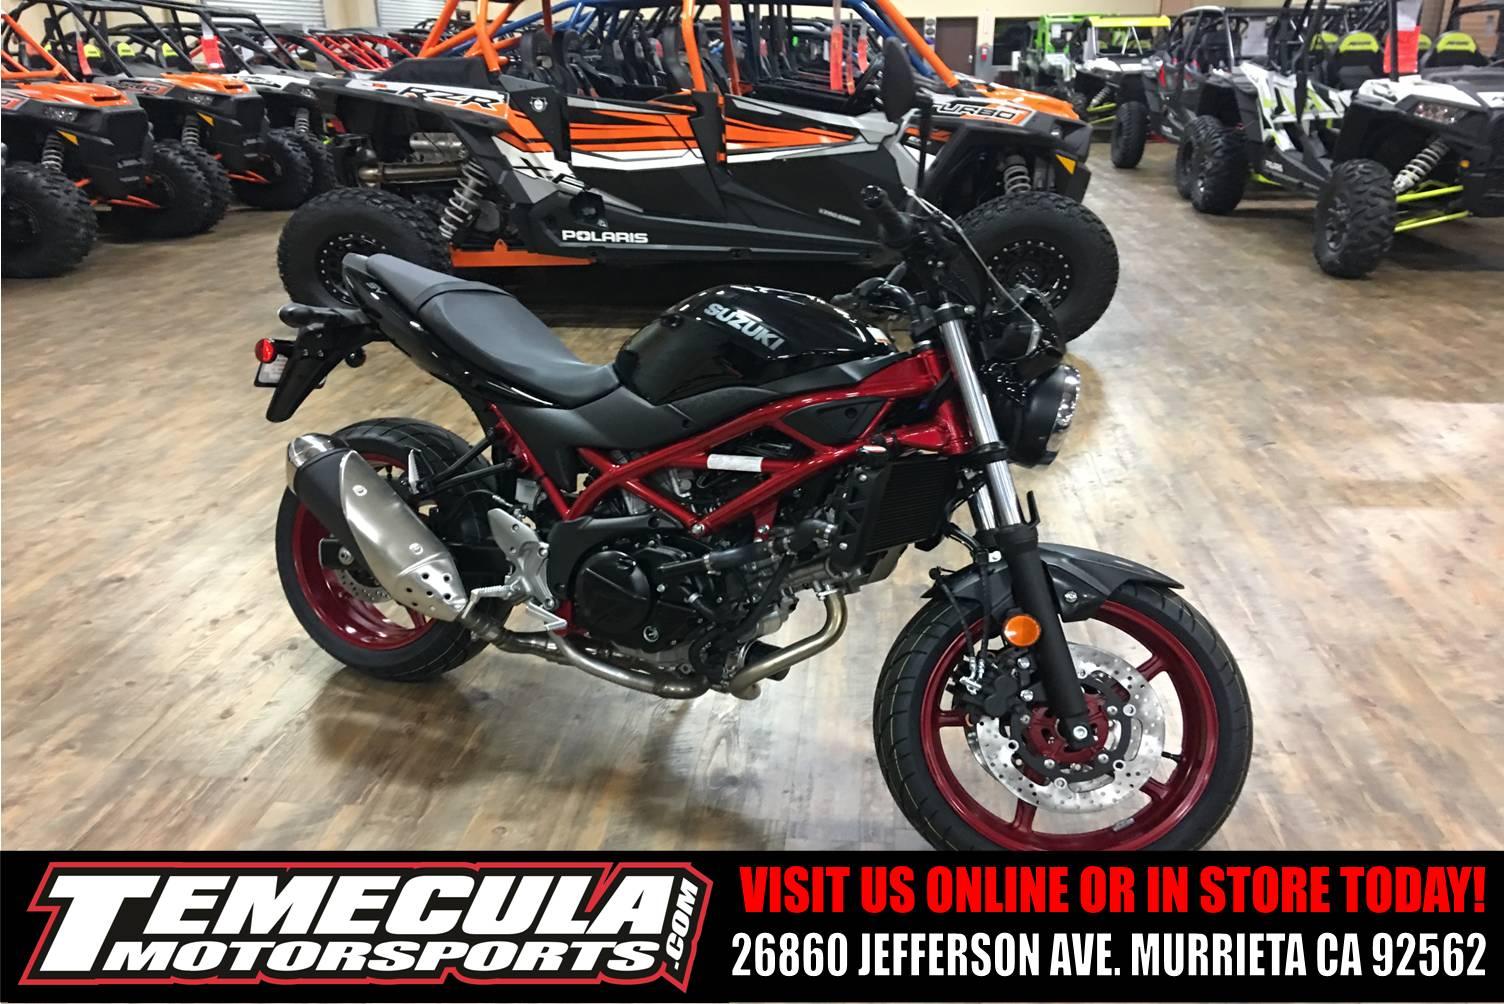 new 2018 suzuki sv650 motorcycles in murrieta ca stock. Black Bedroom Furniture Sets. Home Design Ideas